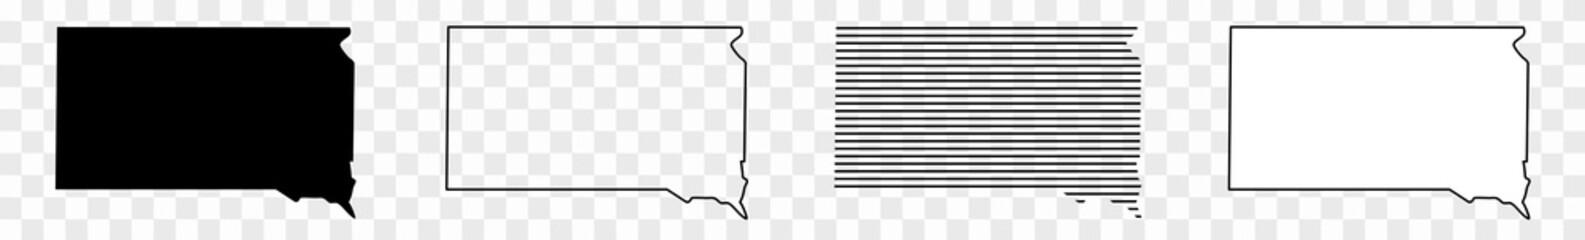 South Dakota Map Black | State Border | United States | US America | Transparent Isolated | Variations